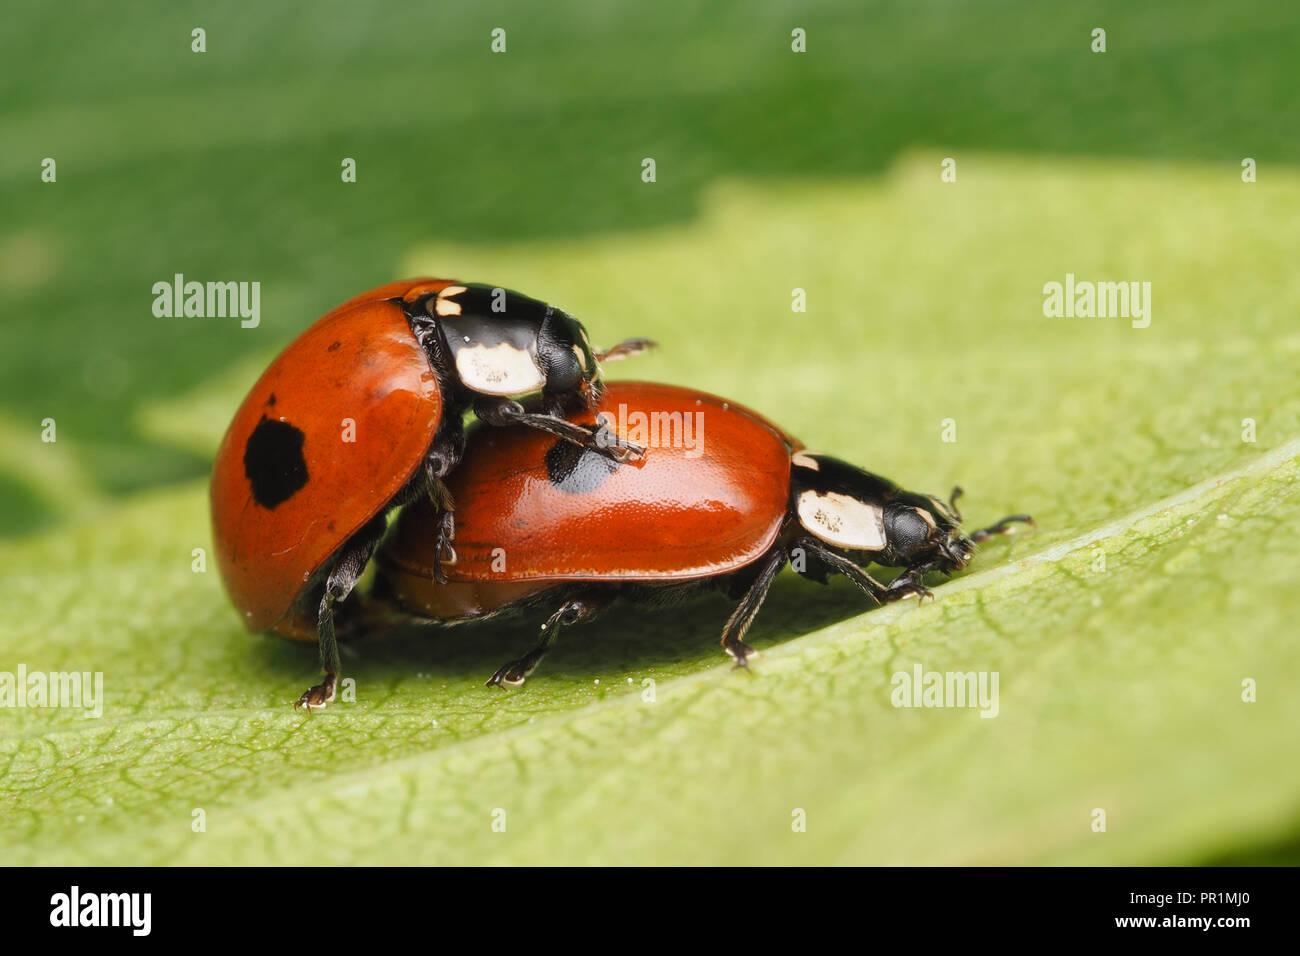 Mating 2 Spot Ladybirds Adalia Bipunctata On Underside Of Birch